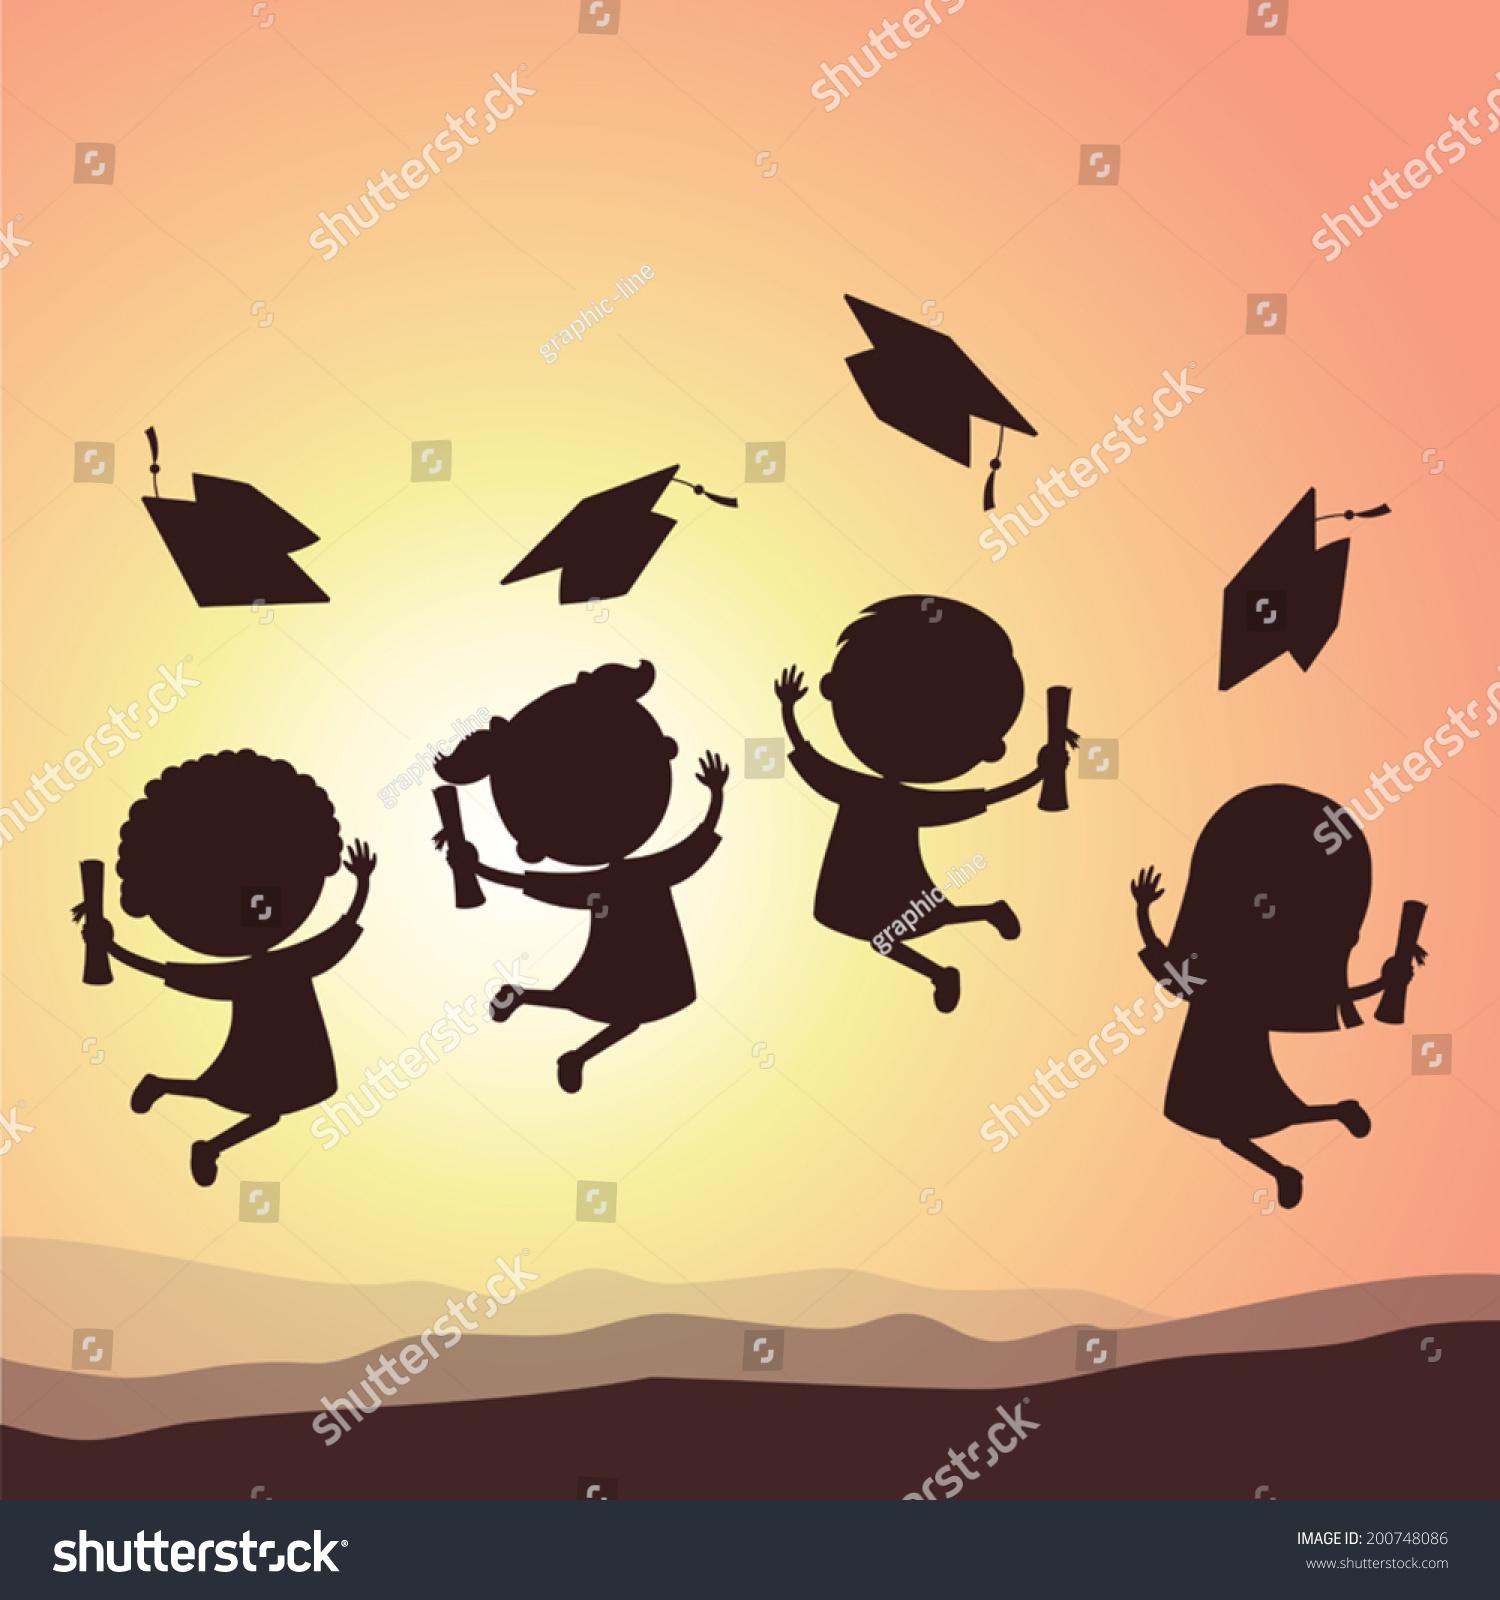 graduation kids silhouette school kids jumping stock